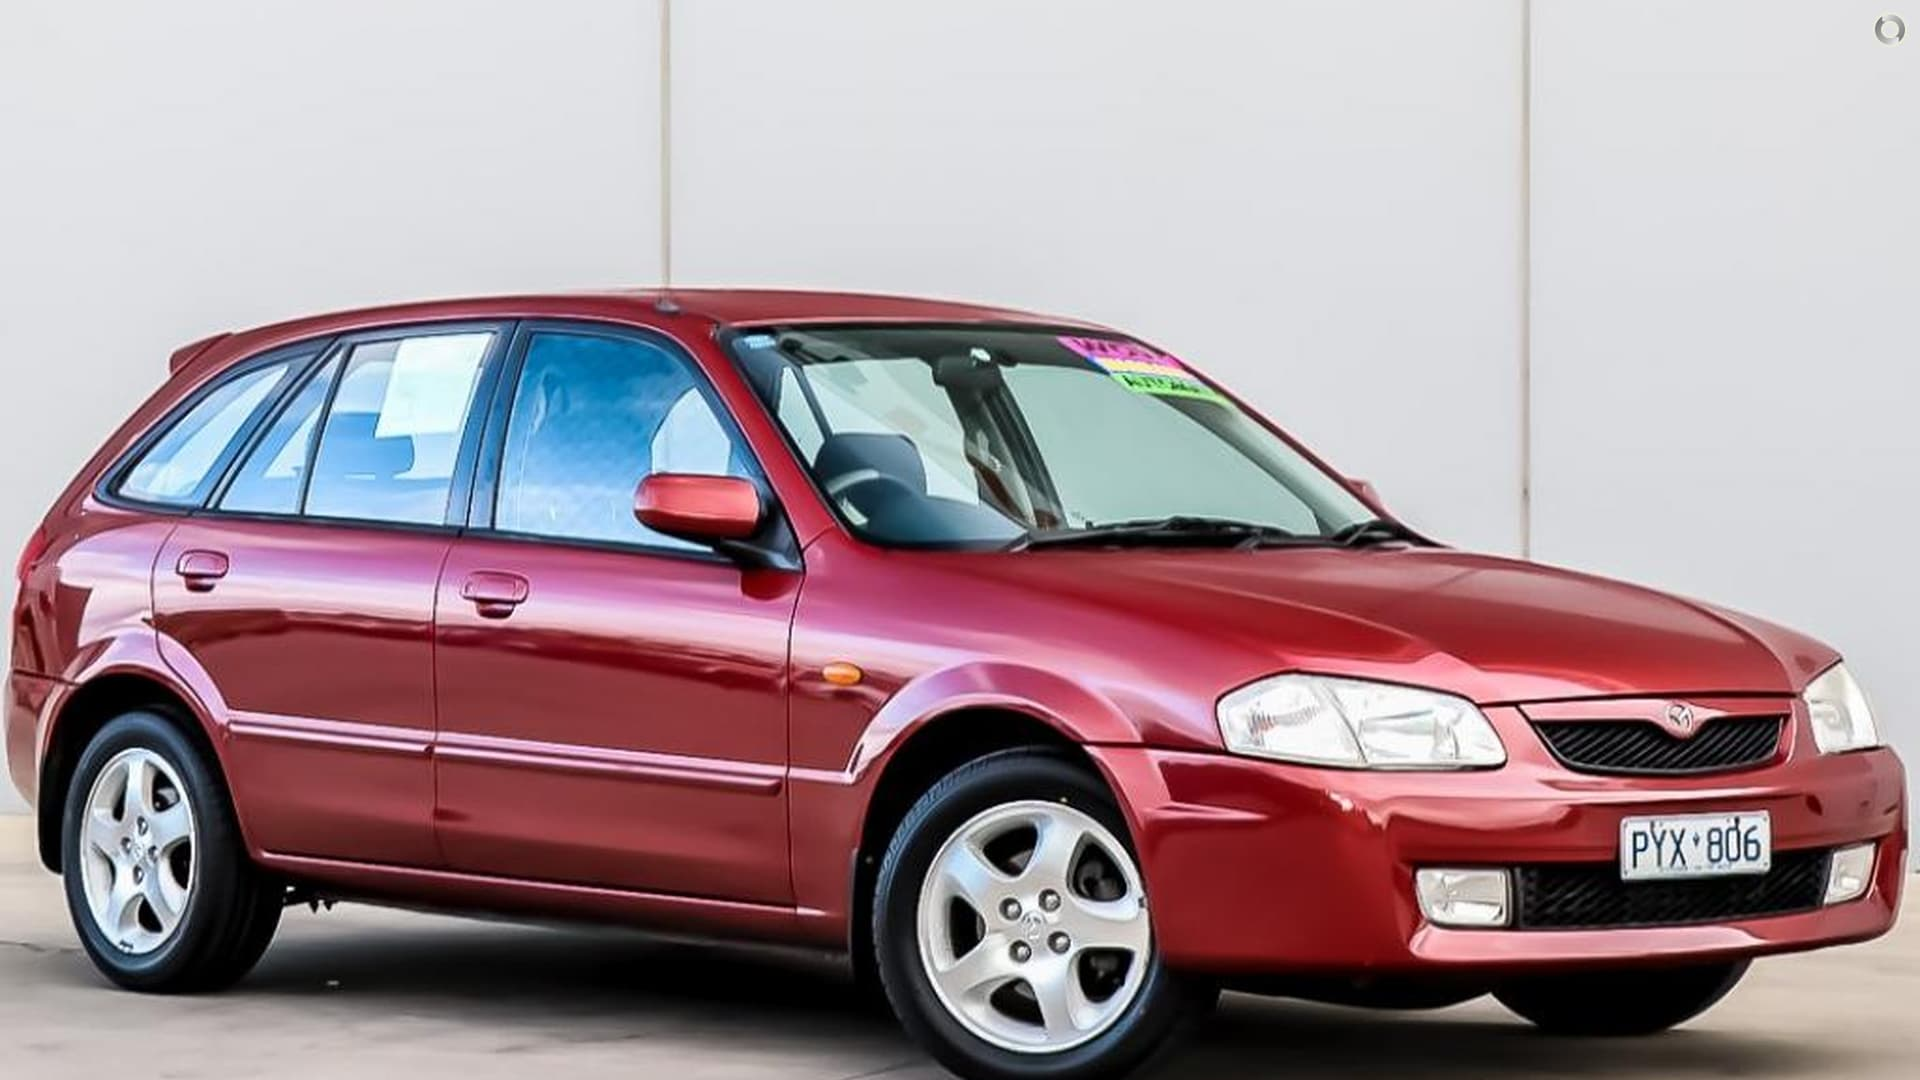 1999 Mazda 323 40th Anniversary Astina BJ